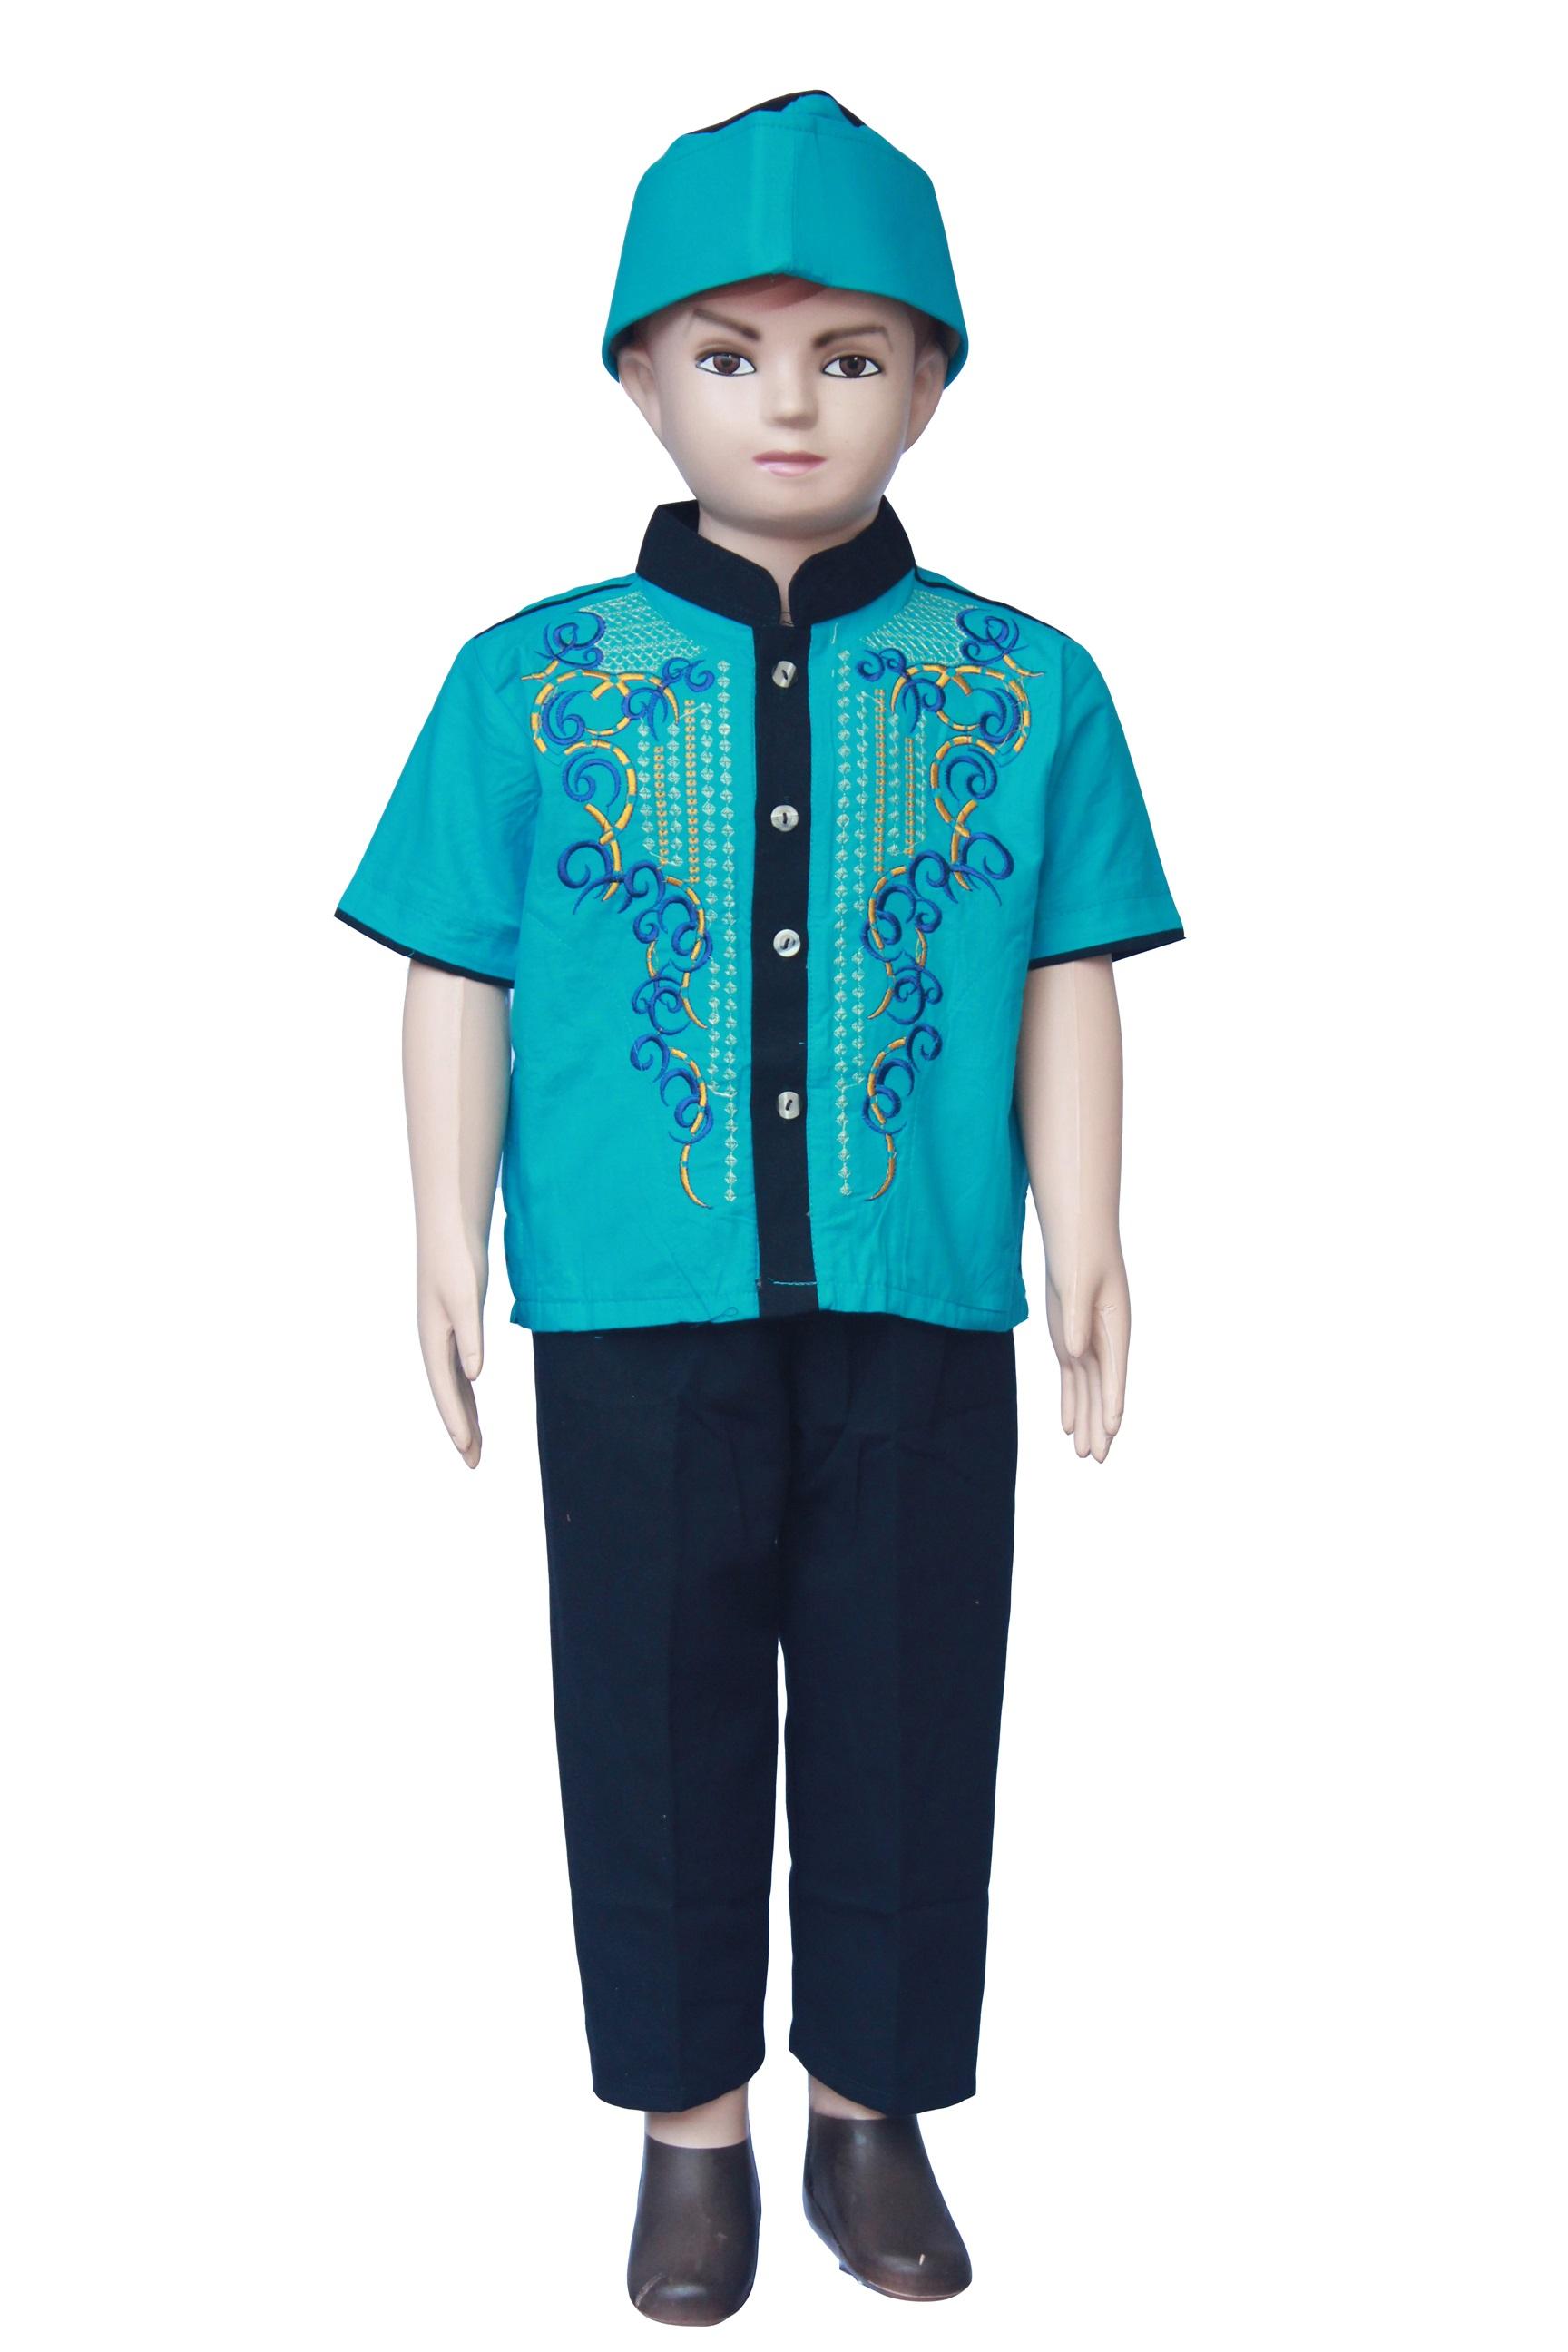 Setelan Baju Koko Anak Laki Laki Terbaru - KOKO A